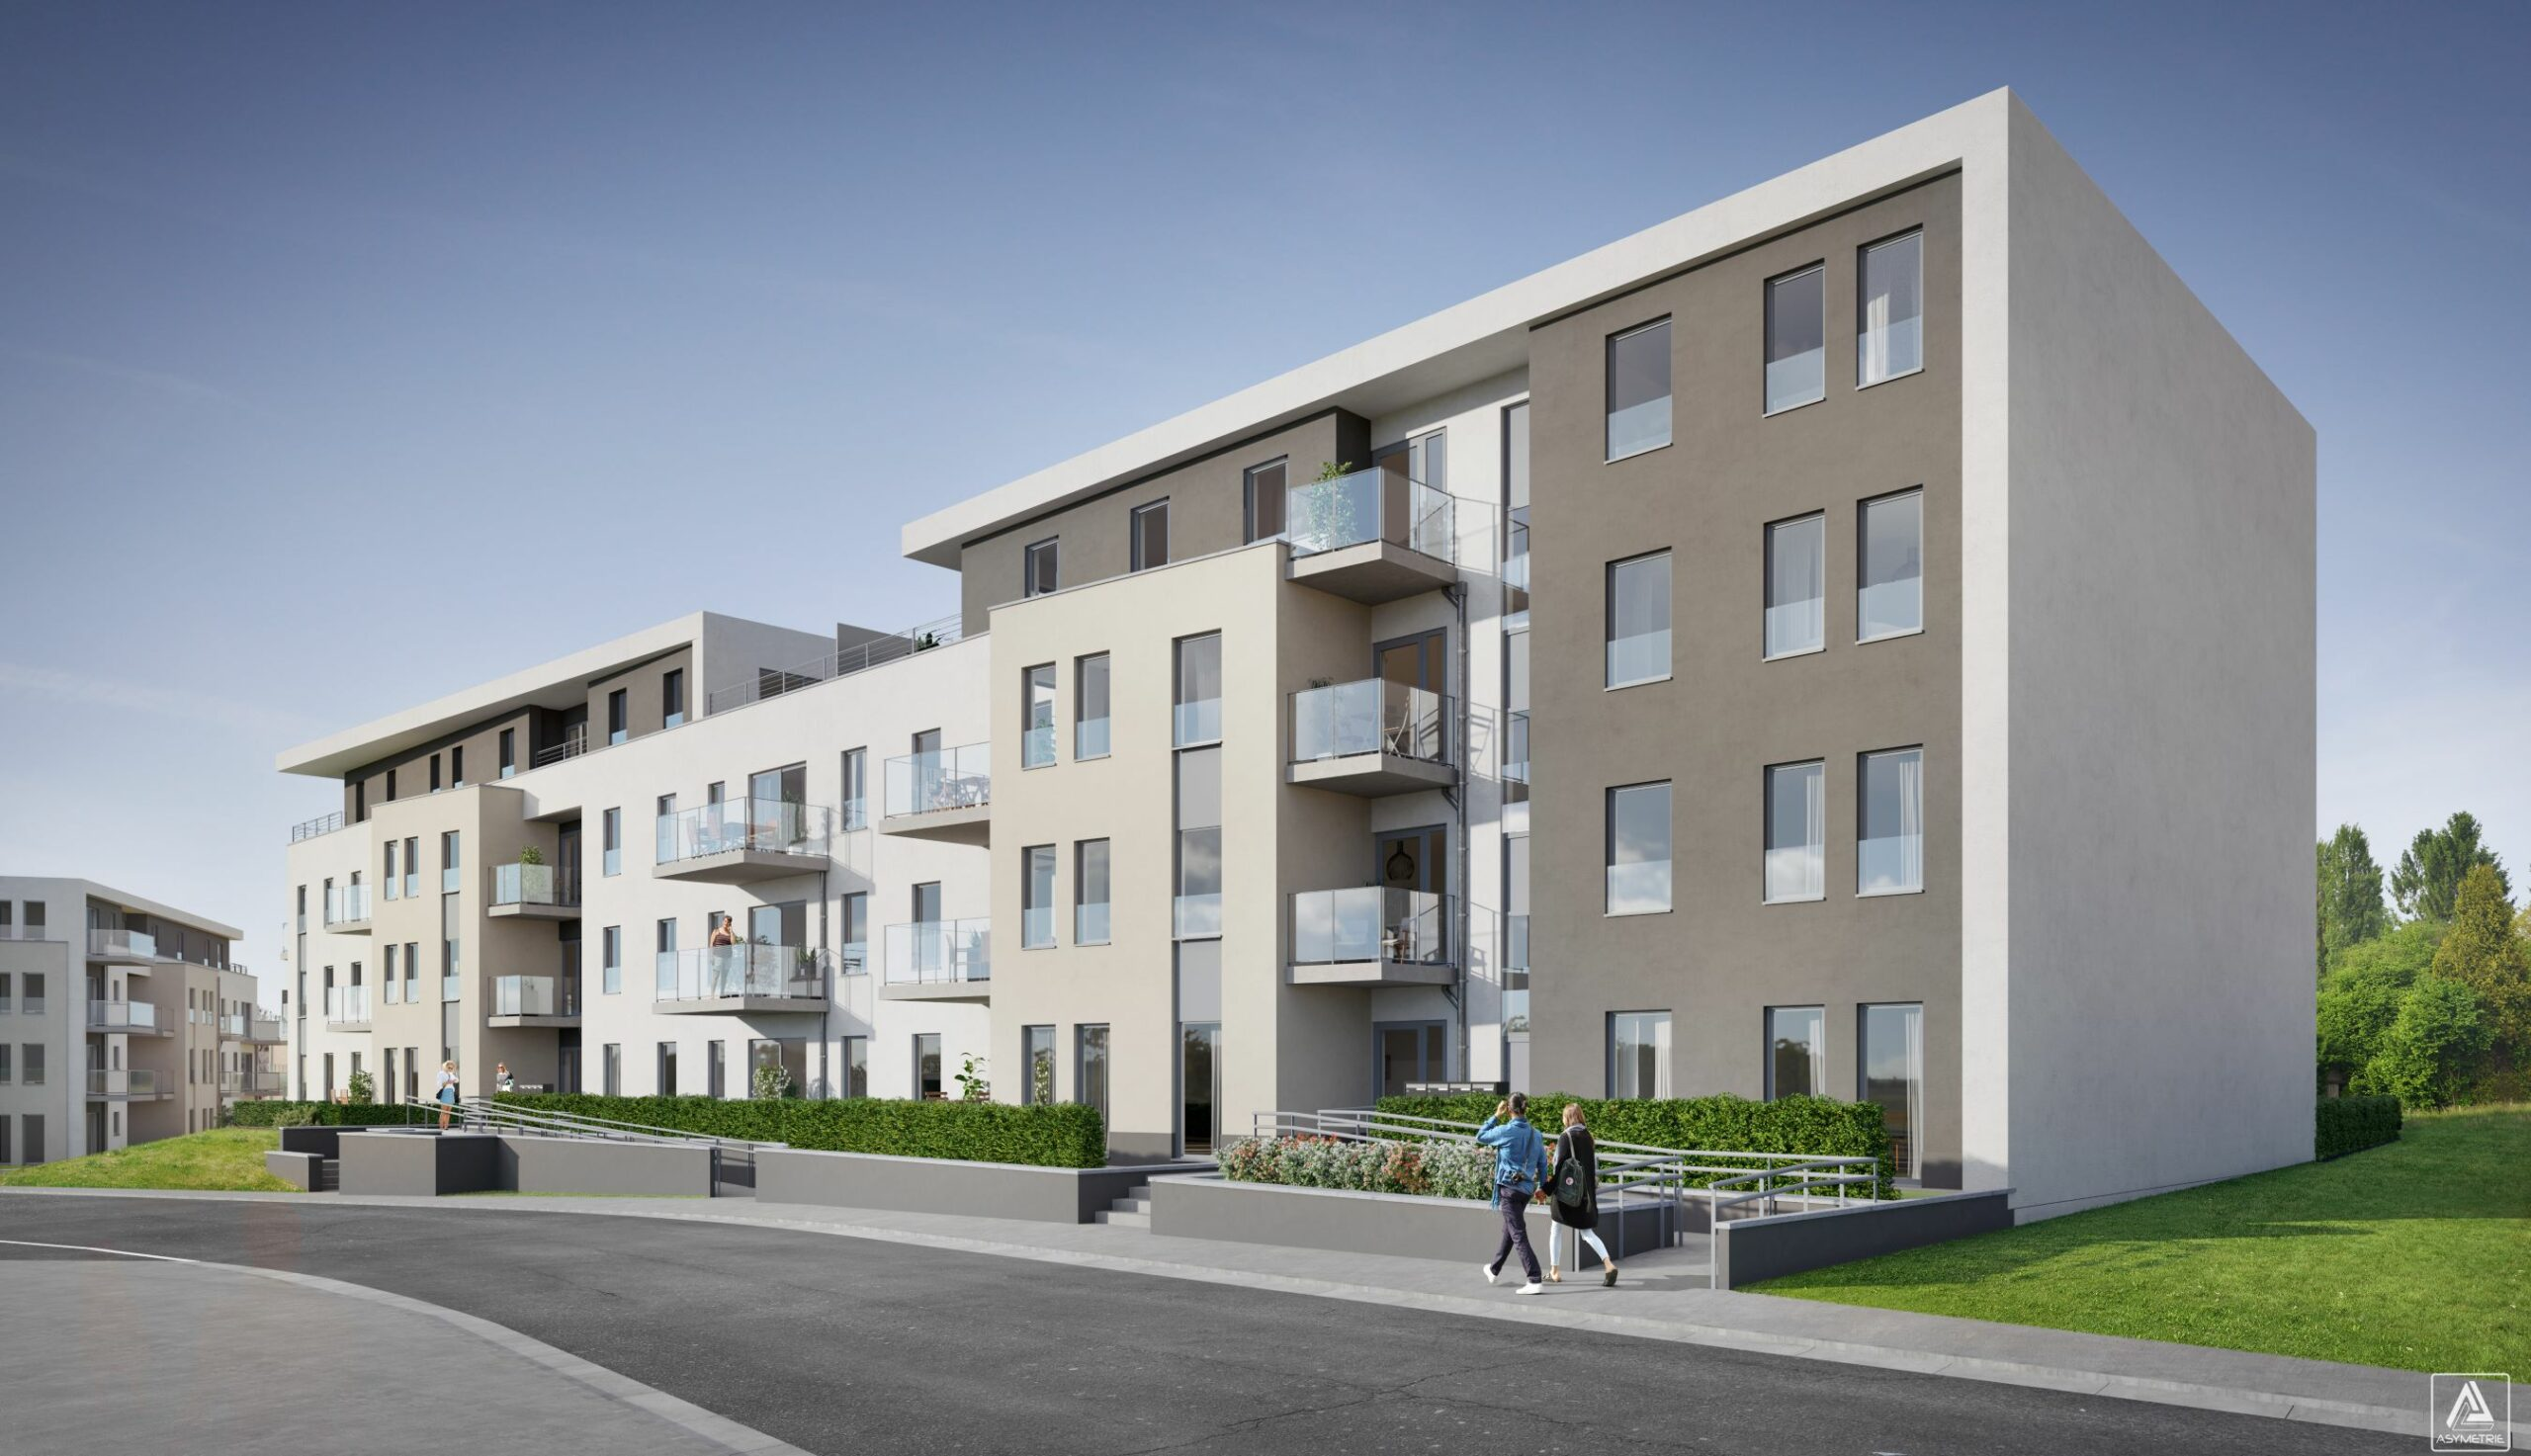 https://sia-arch.eu/wp-content/uploads/2021/10/Libramont-Immeuble-rue-du-Vicinal-Vue-B-Rifontaine-scaled.jpg